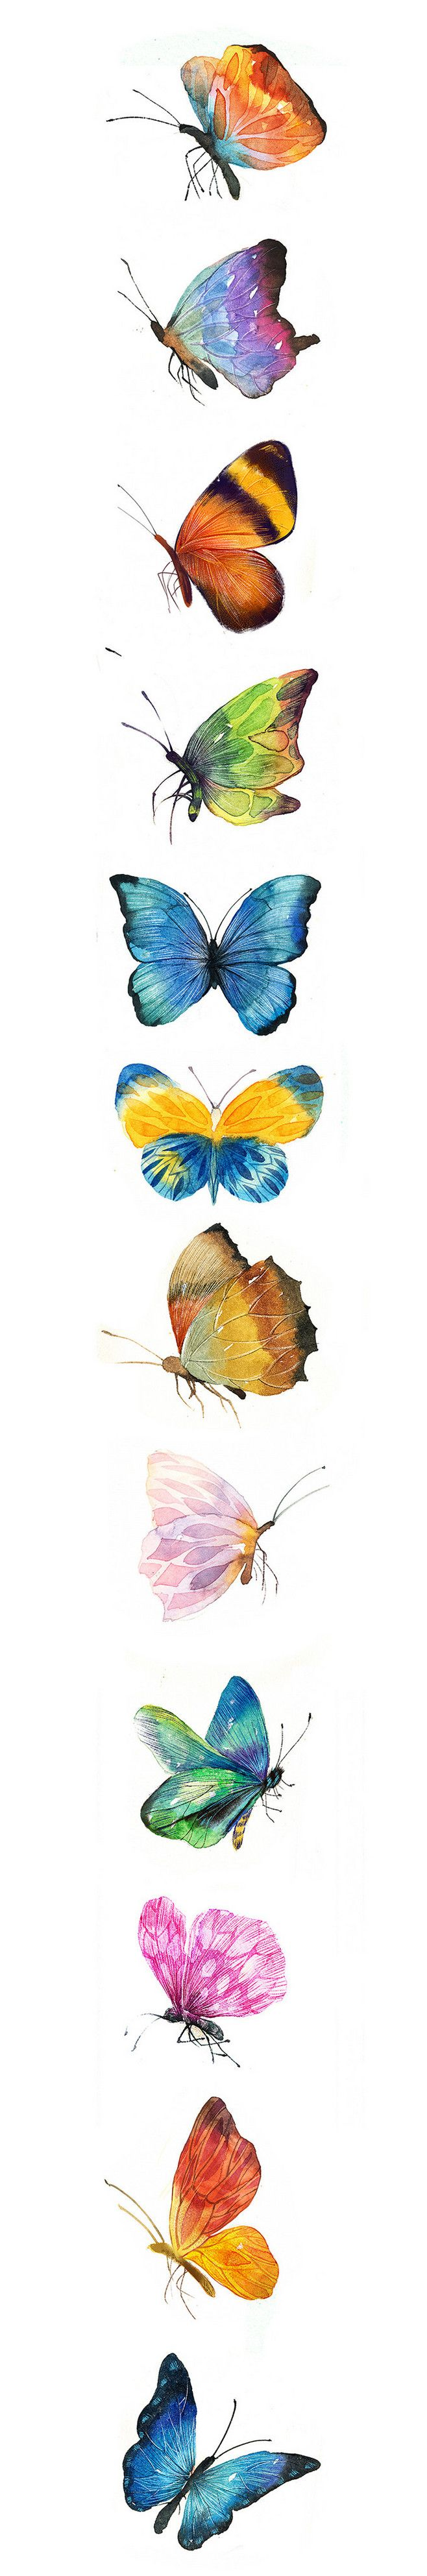 Papillons peintes